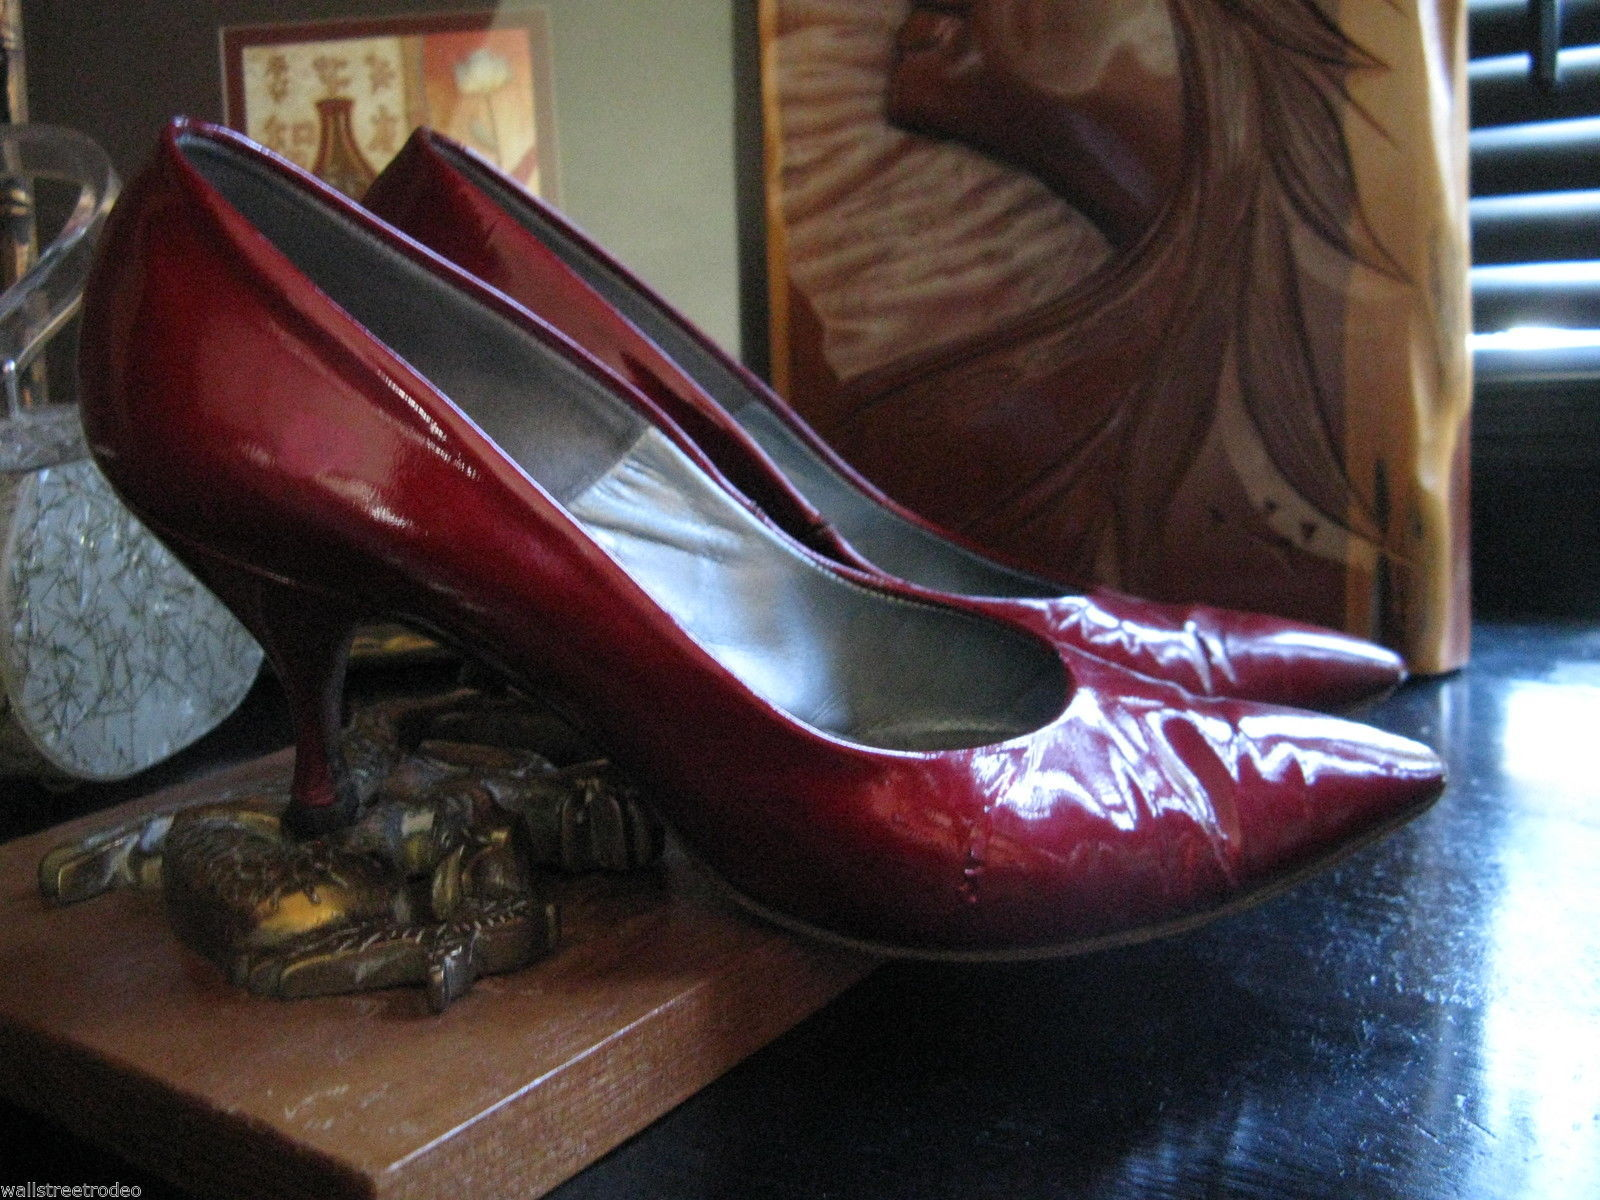 Smartaire vintage Debbie Renolds heels shoes 7 1/2 AAAA VLV 6 UK3.5 36 bonus VLV image 8